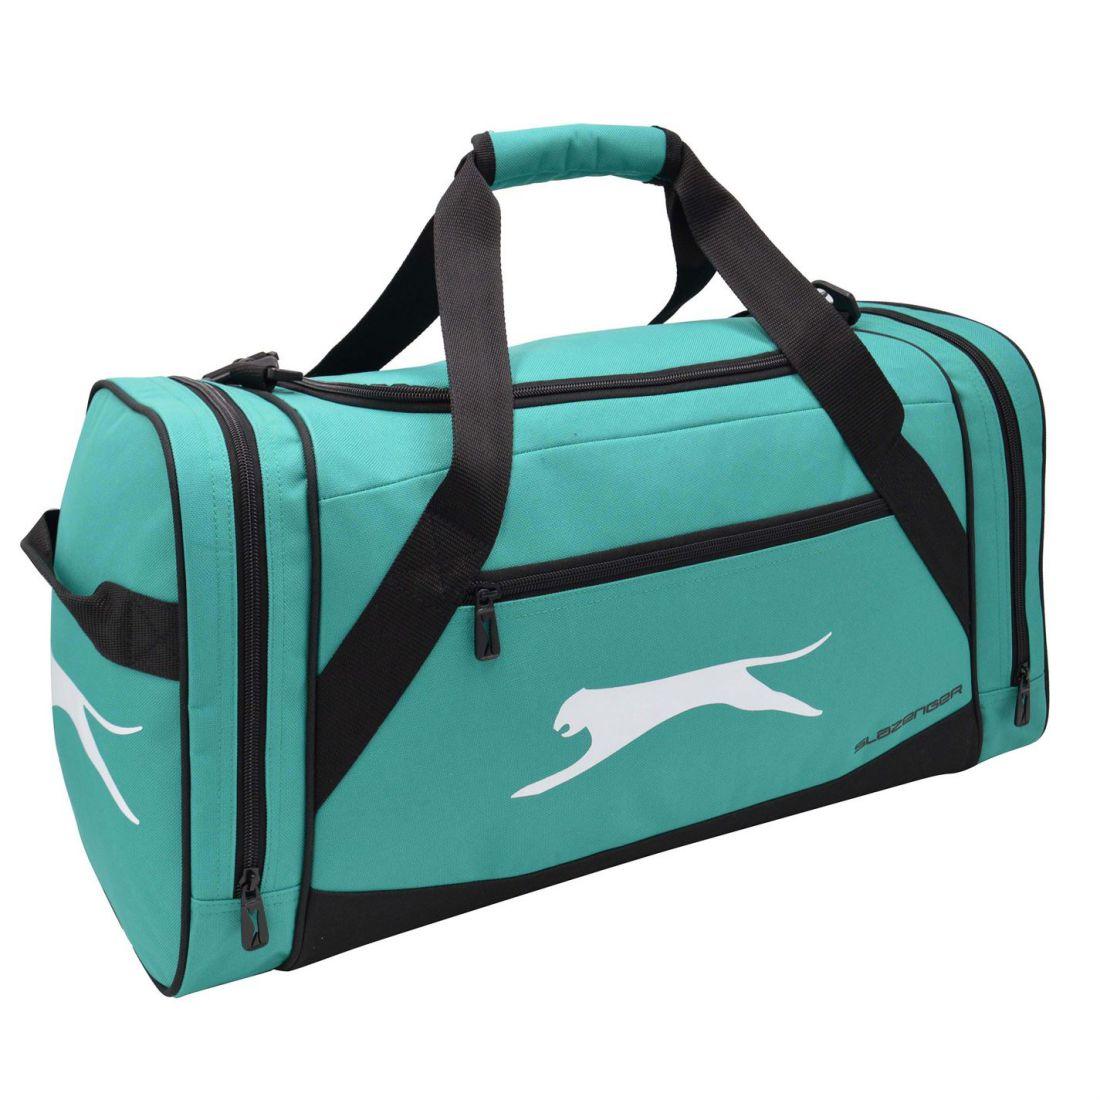 6debbb2a58 Slazenger Medium Holdall Zip Pockets Baggage Traveling Sack Accessory 6 6  di 6 Vedi Altro